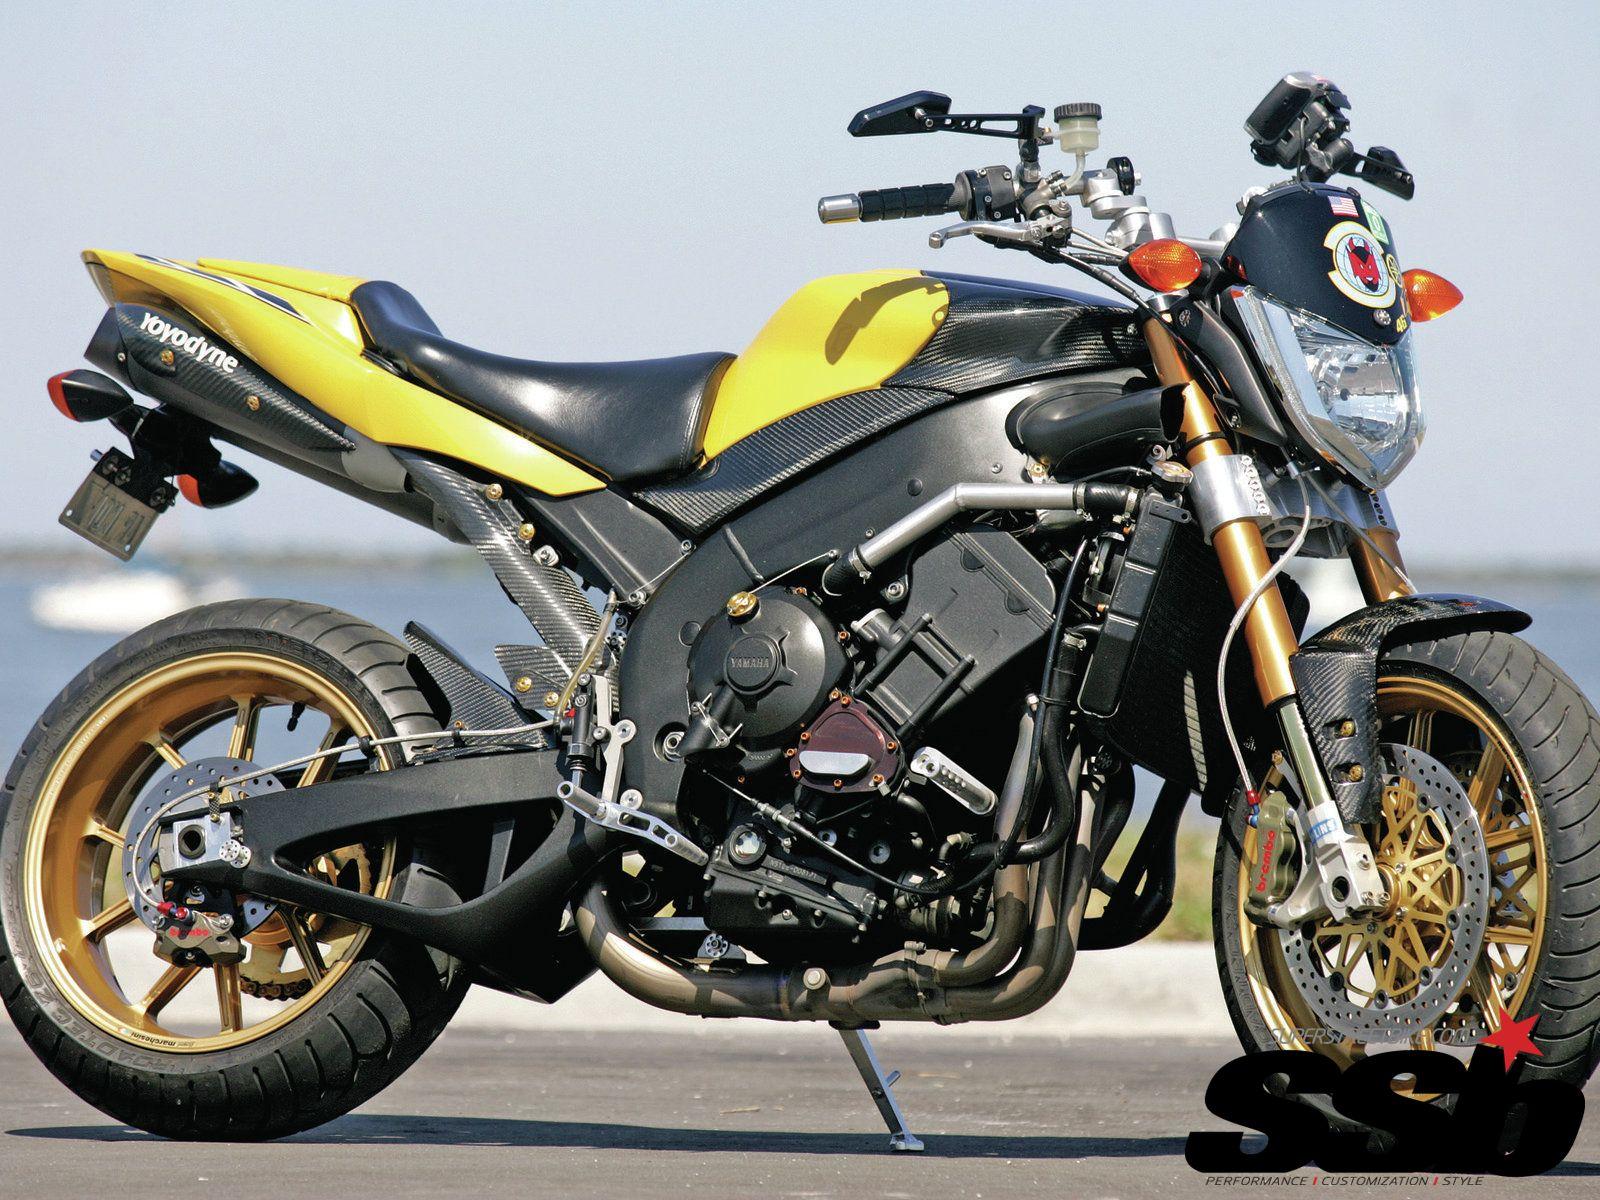 2006 yamaha fz 1 fazer motorcycle streetfighter photo 1 - 2004 Yamaha Fz1 Tuning 3